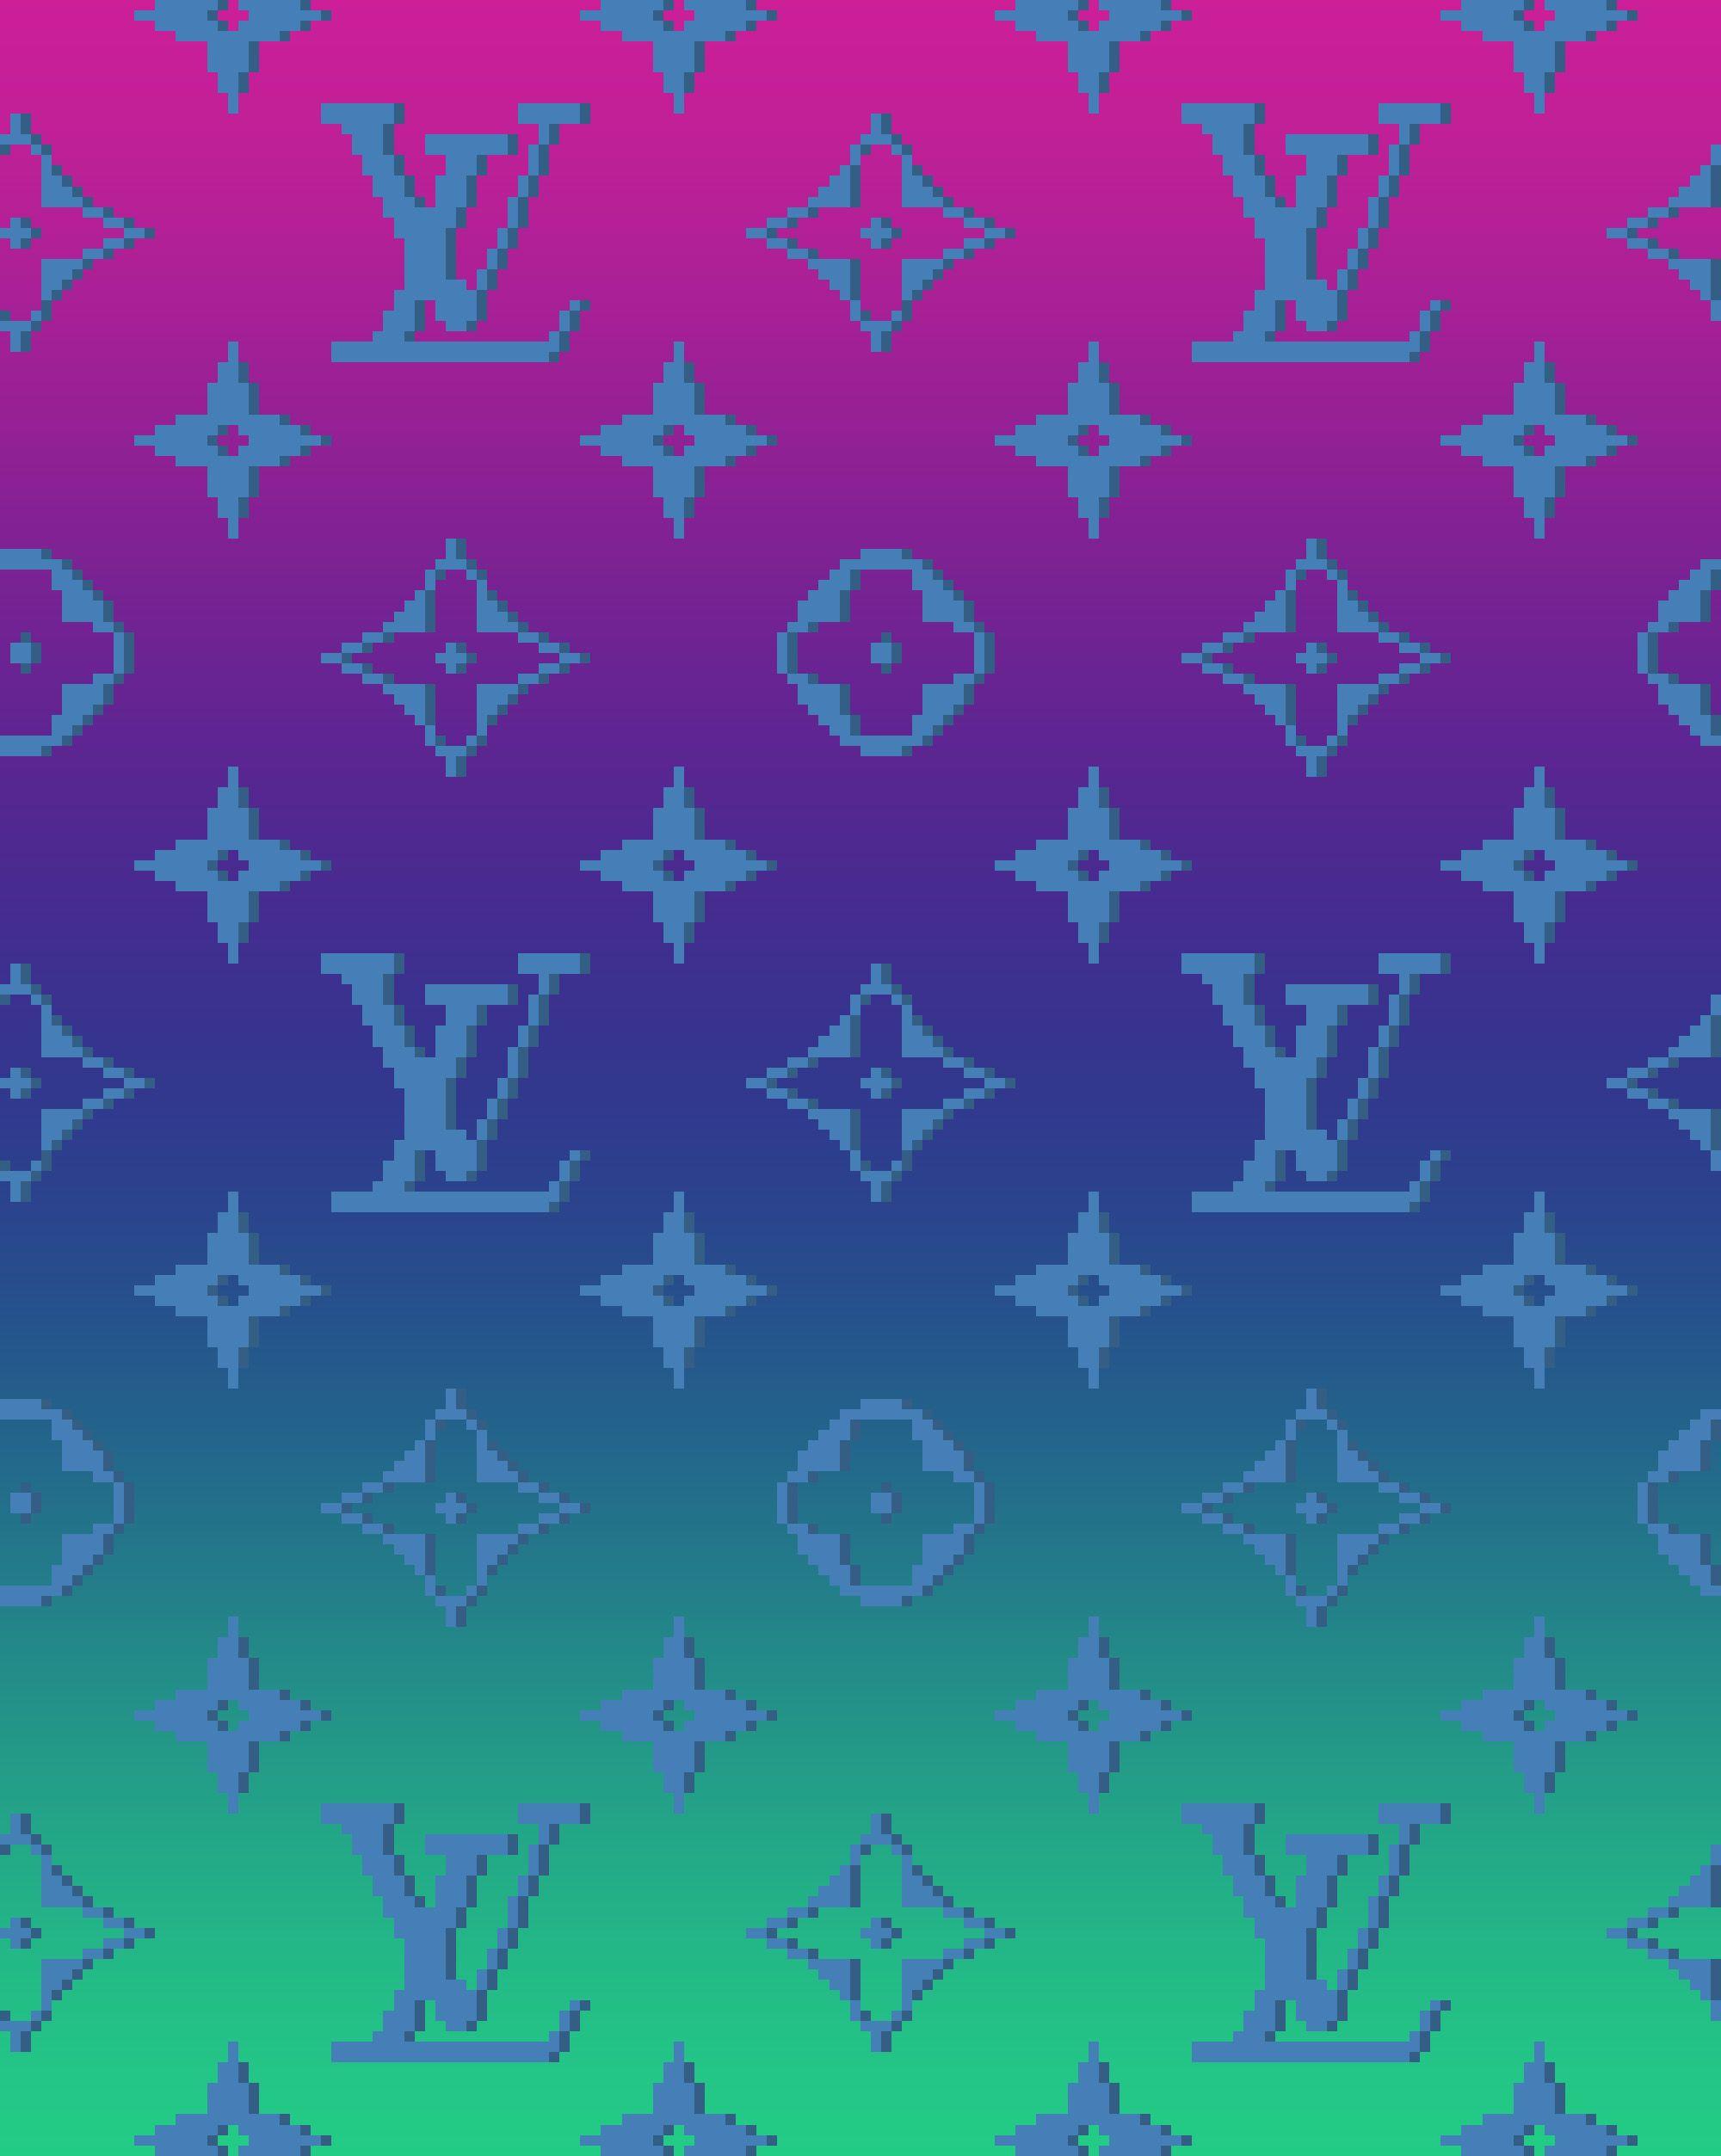 Louis Vuitton Pixel Monogram Pixel Art Cool Wallpaper Photo